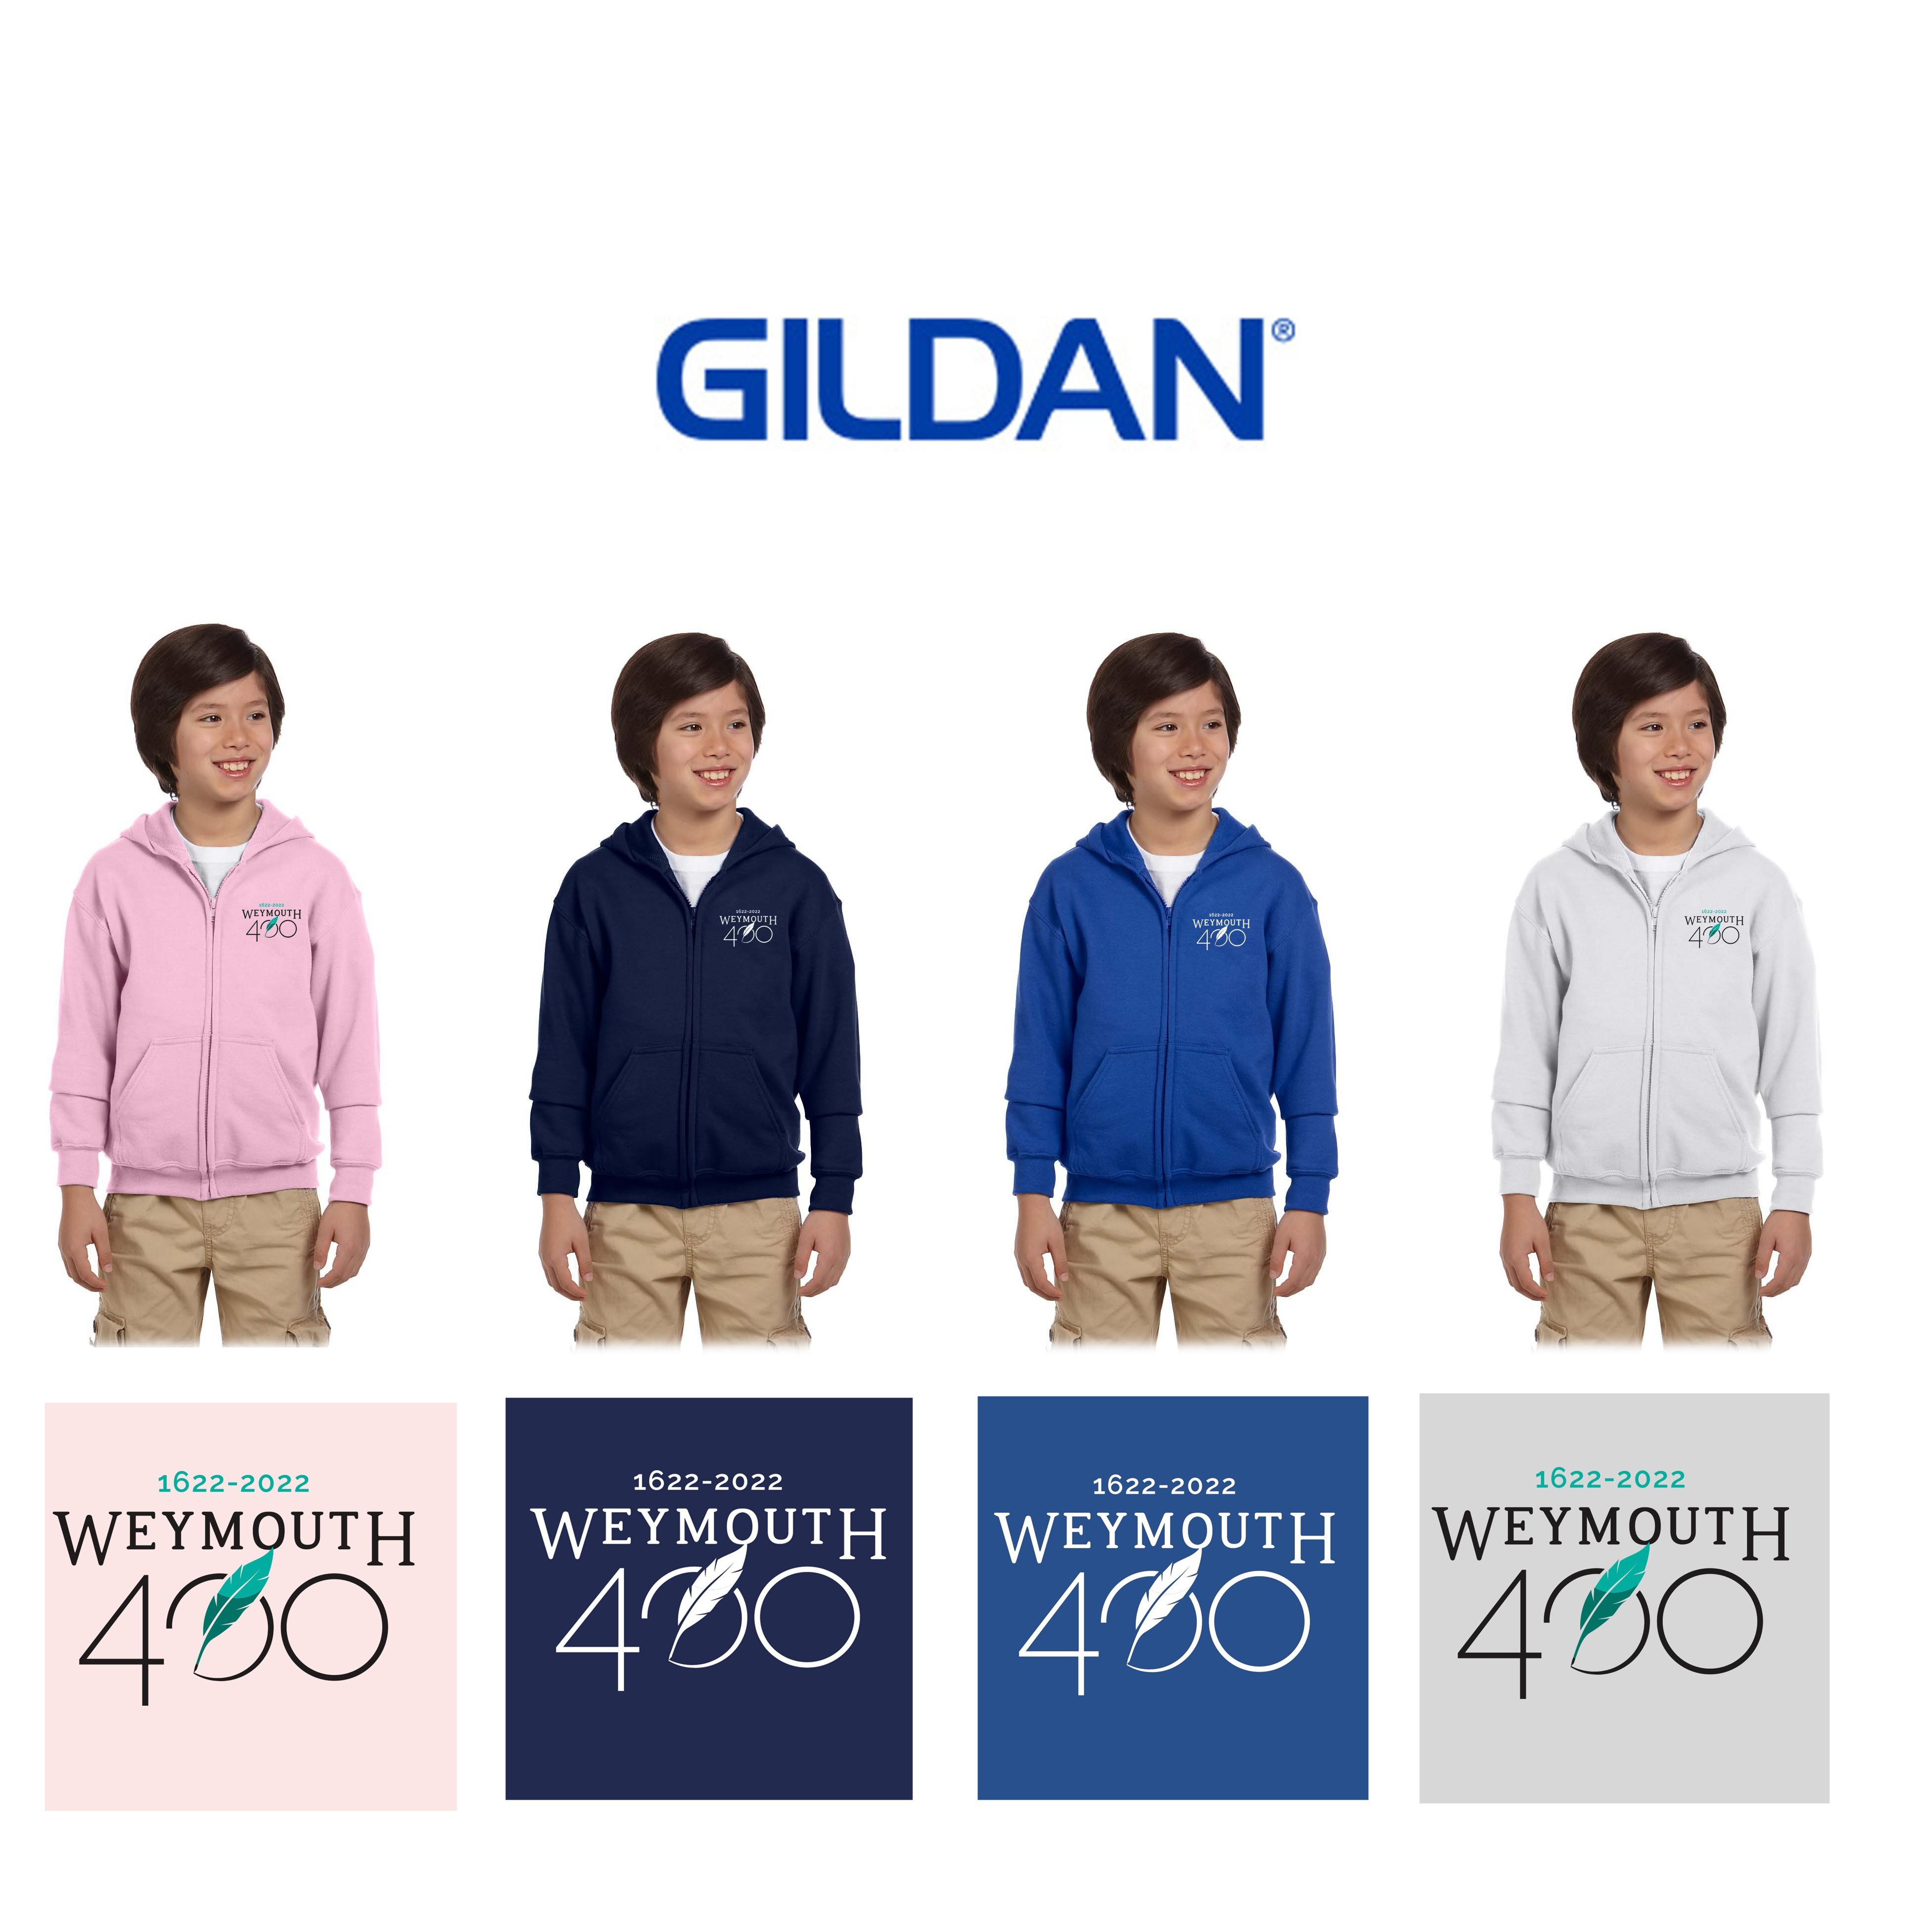 Weymouth 400 Gildan Youth Heavy Blend™ 8 oz., 50/50 Full-Zip Hooded Sweatshirt, Embroidered